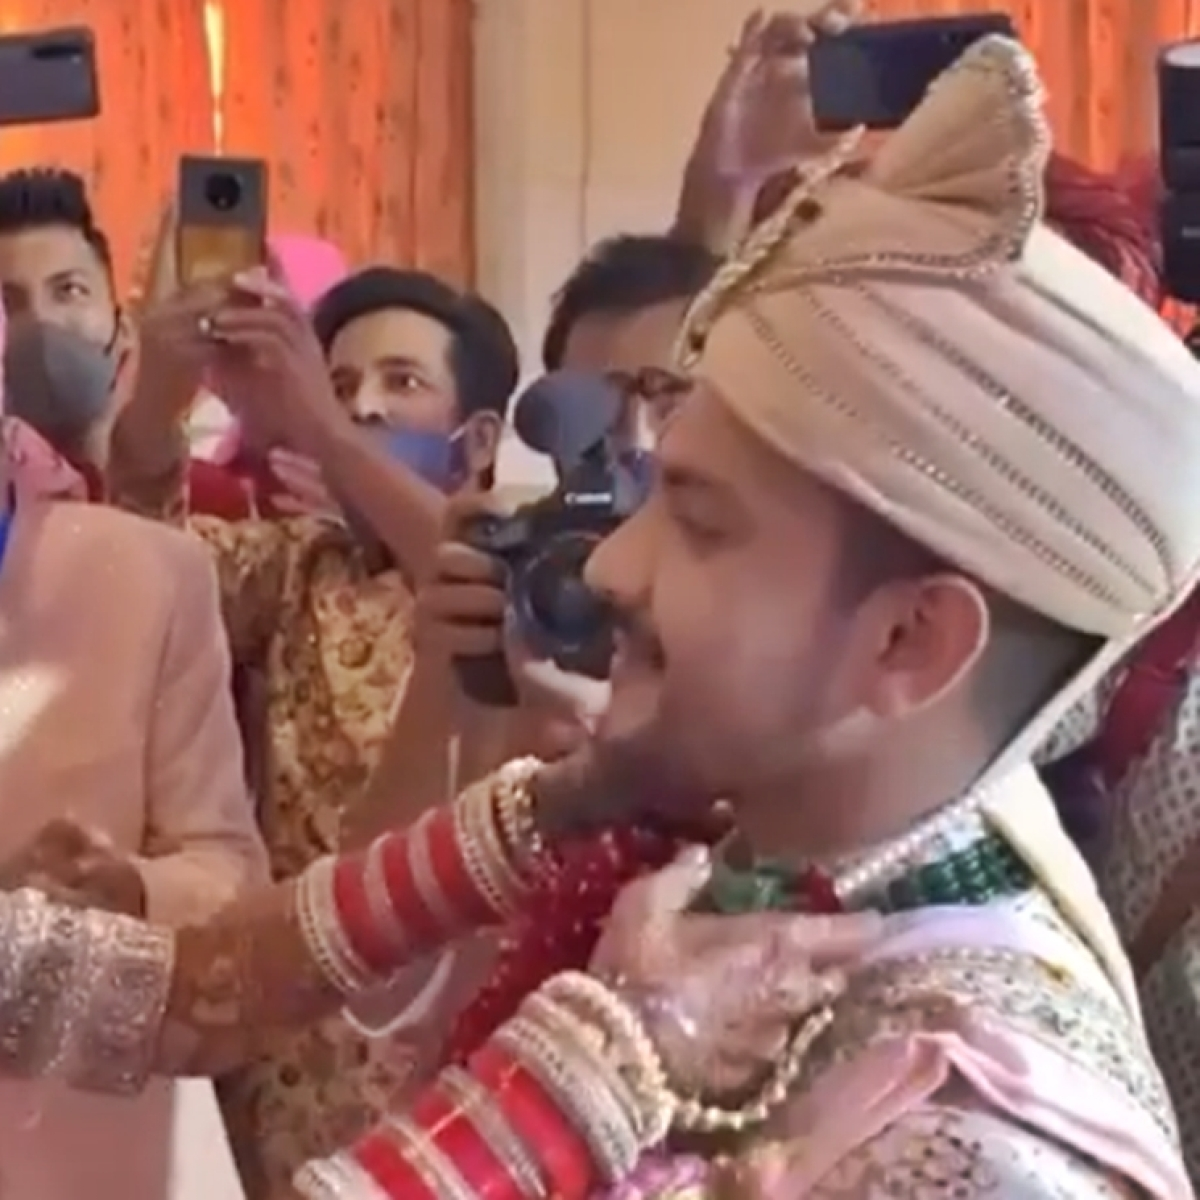 Watch: Aditya Narayan suffers wardrobe malfunction during the 'varmala' ceremony at his wedding